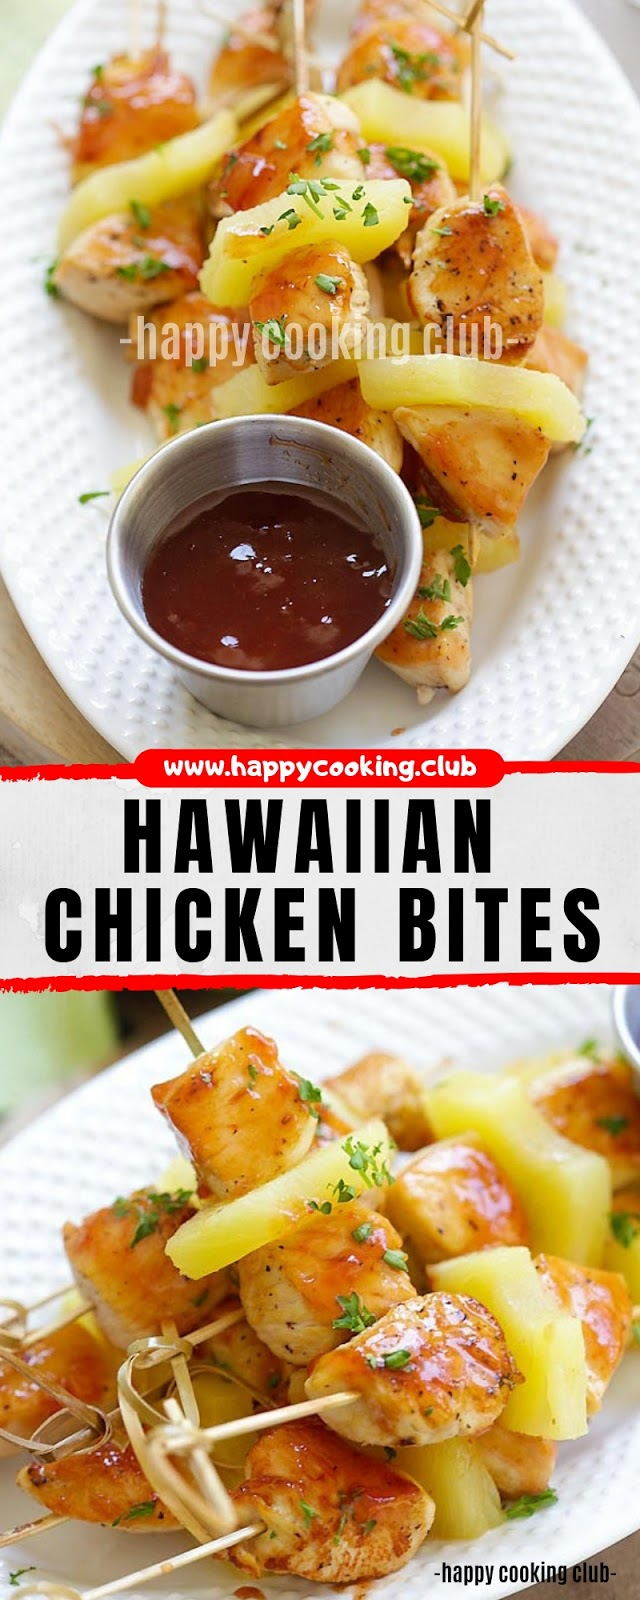 HAWAIIAN CHICKEN BITES